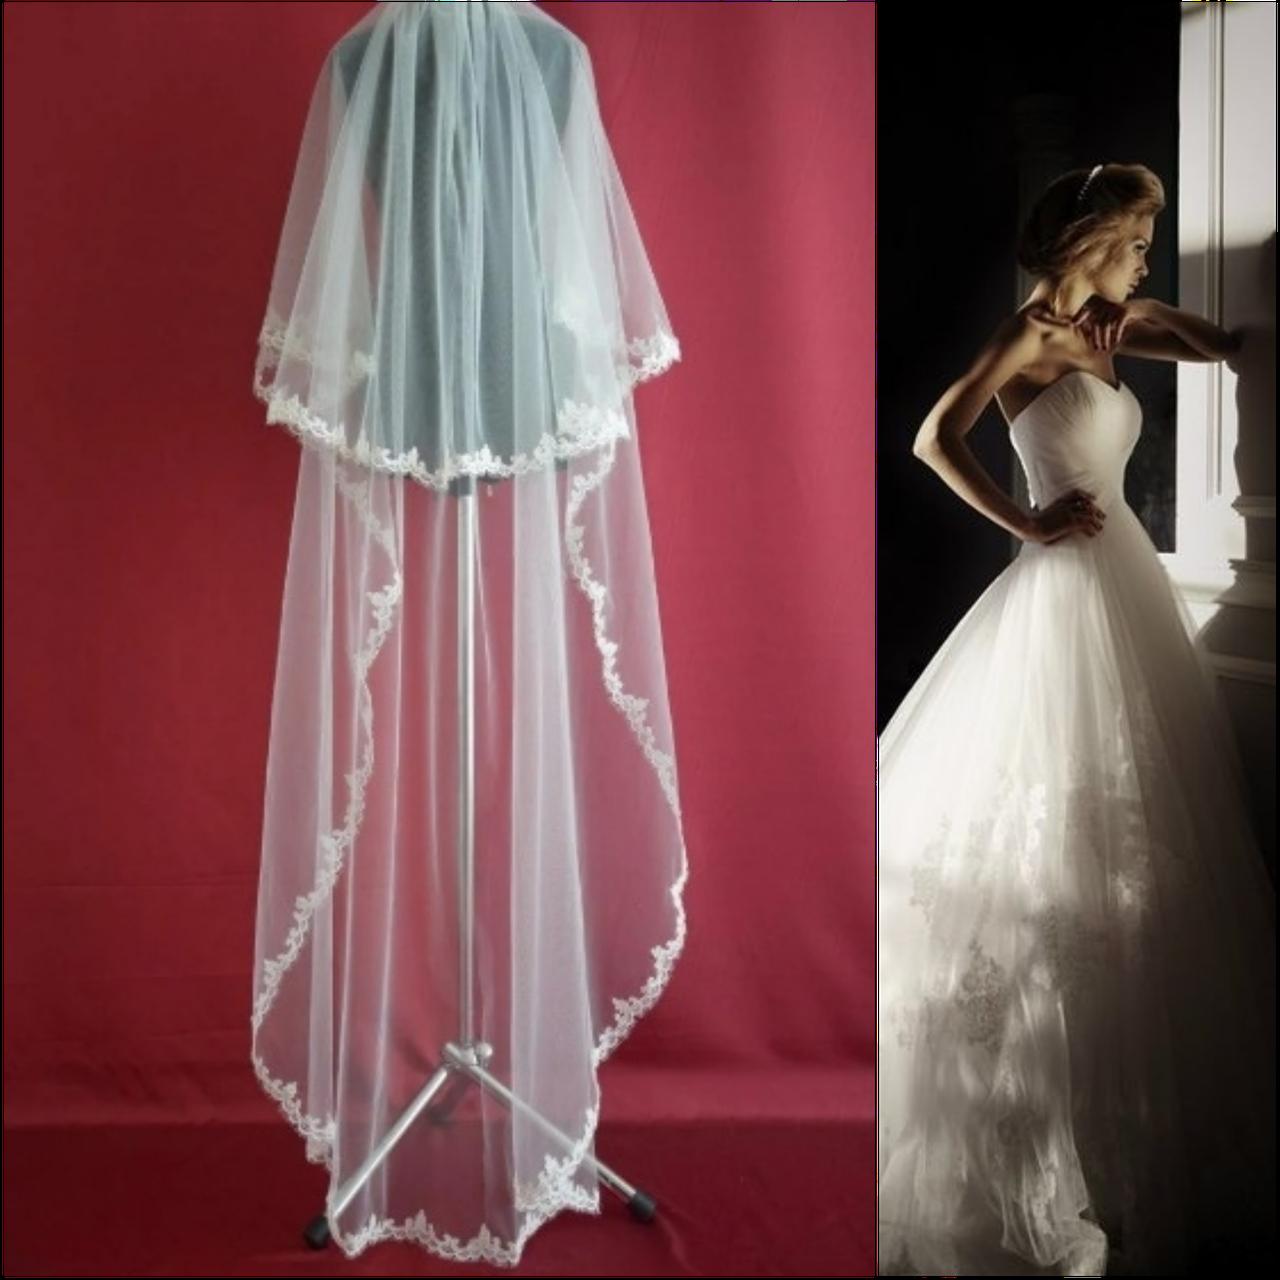 Двухъярусная свадебная Фата до пола с кружевом SF для Невесты белая (sf-008)